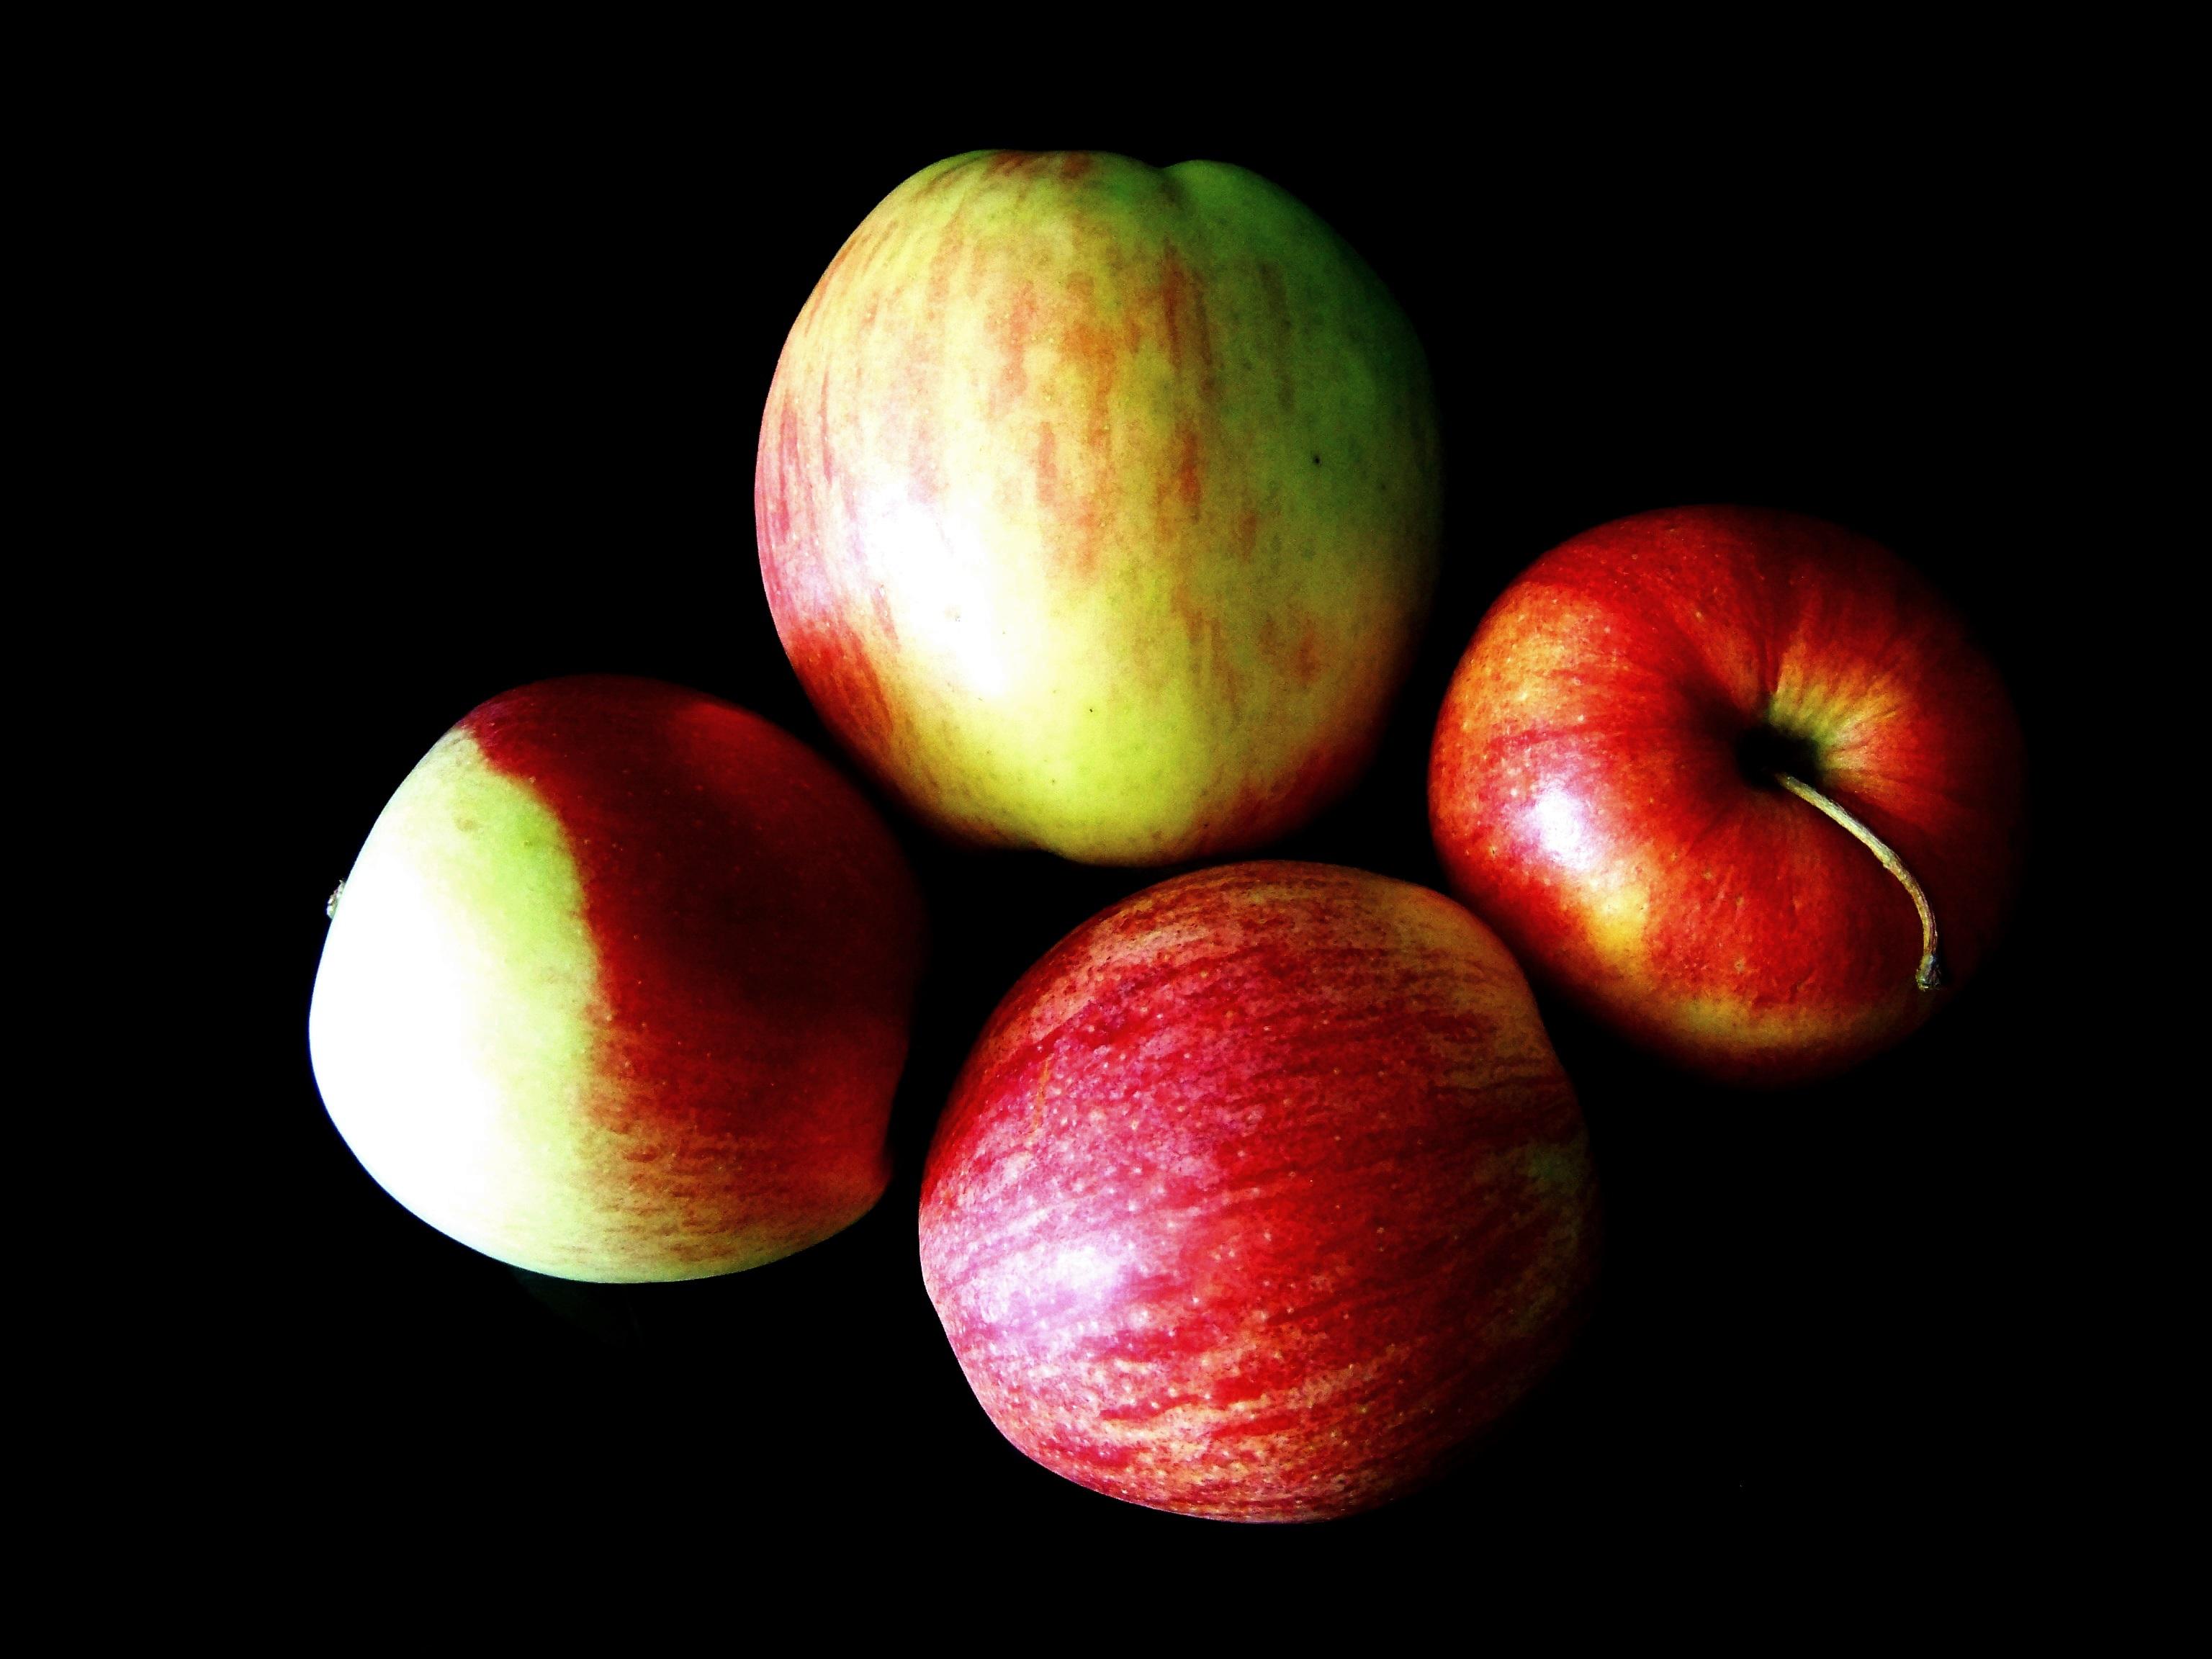 100 Gambar Apel Hijau Dan Merah Paling Keren